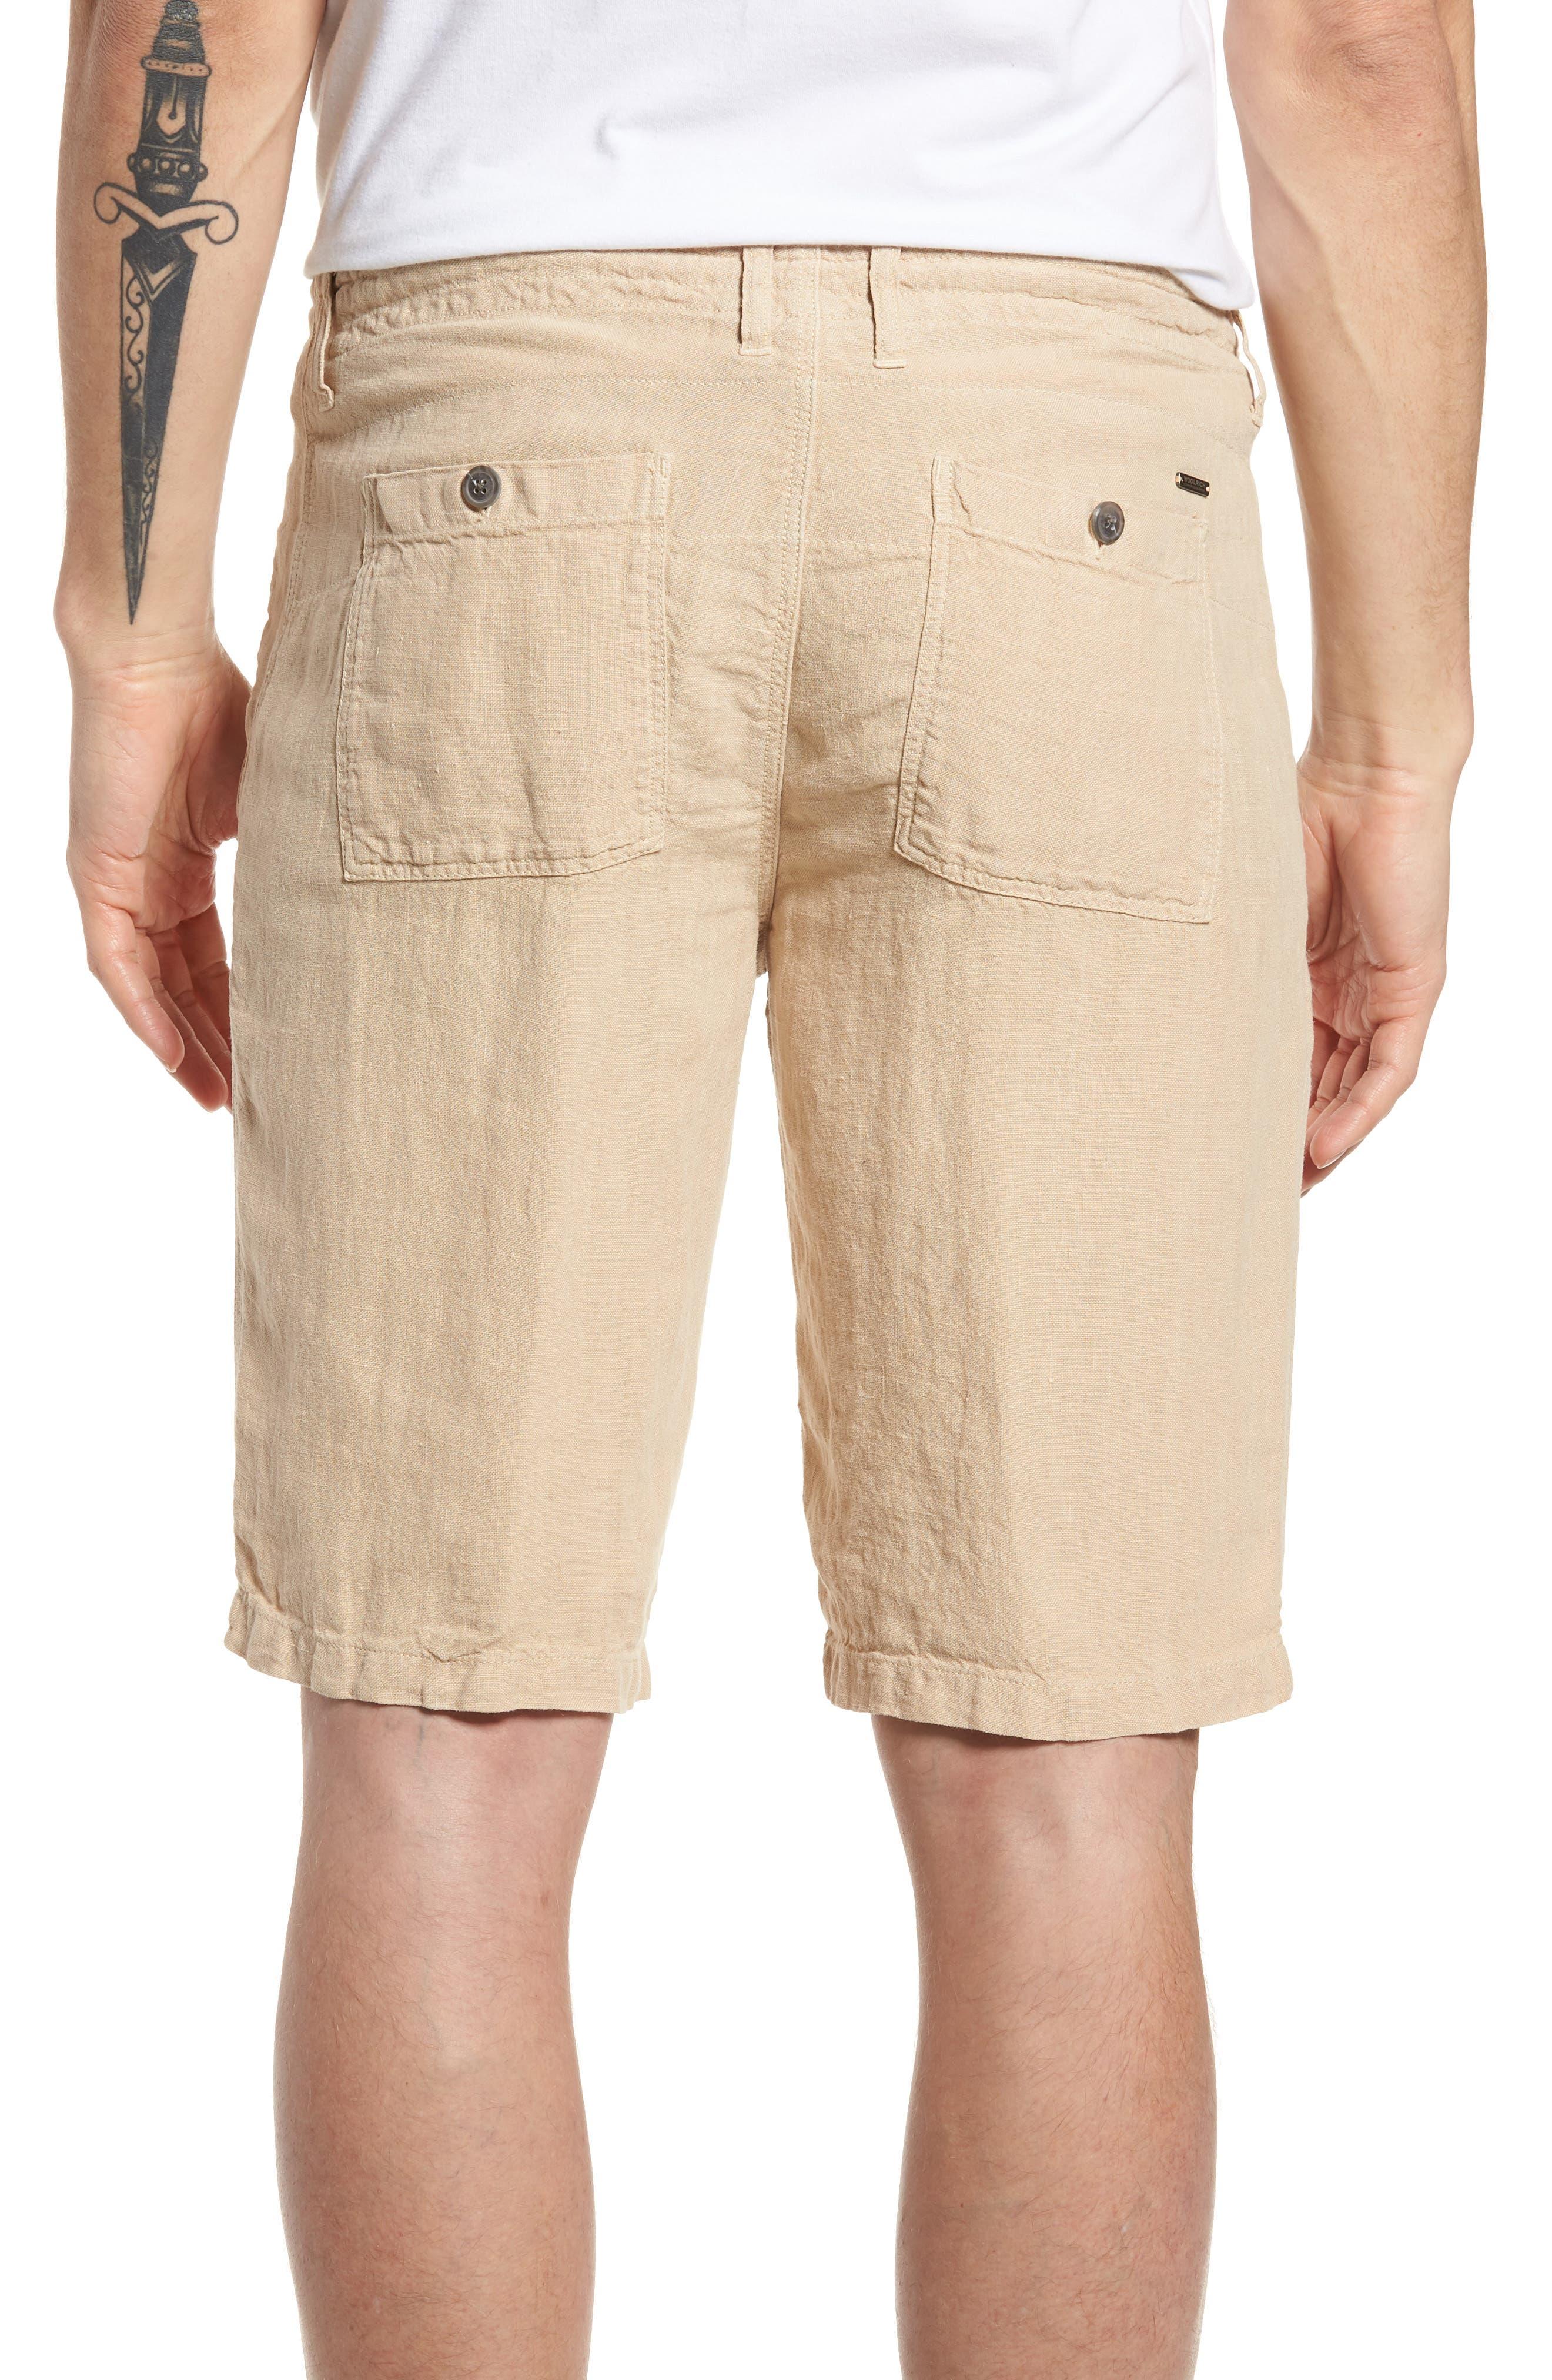 & Bros. Linen Shorts,                             Alternate thumbnail 2, color,                             200